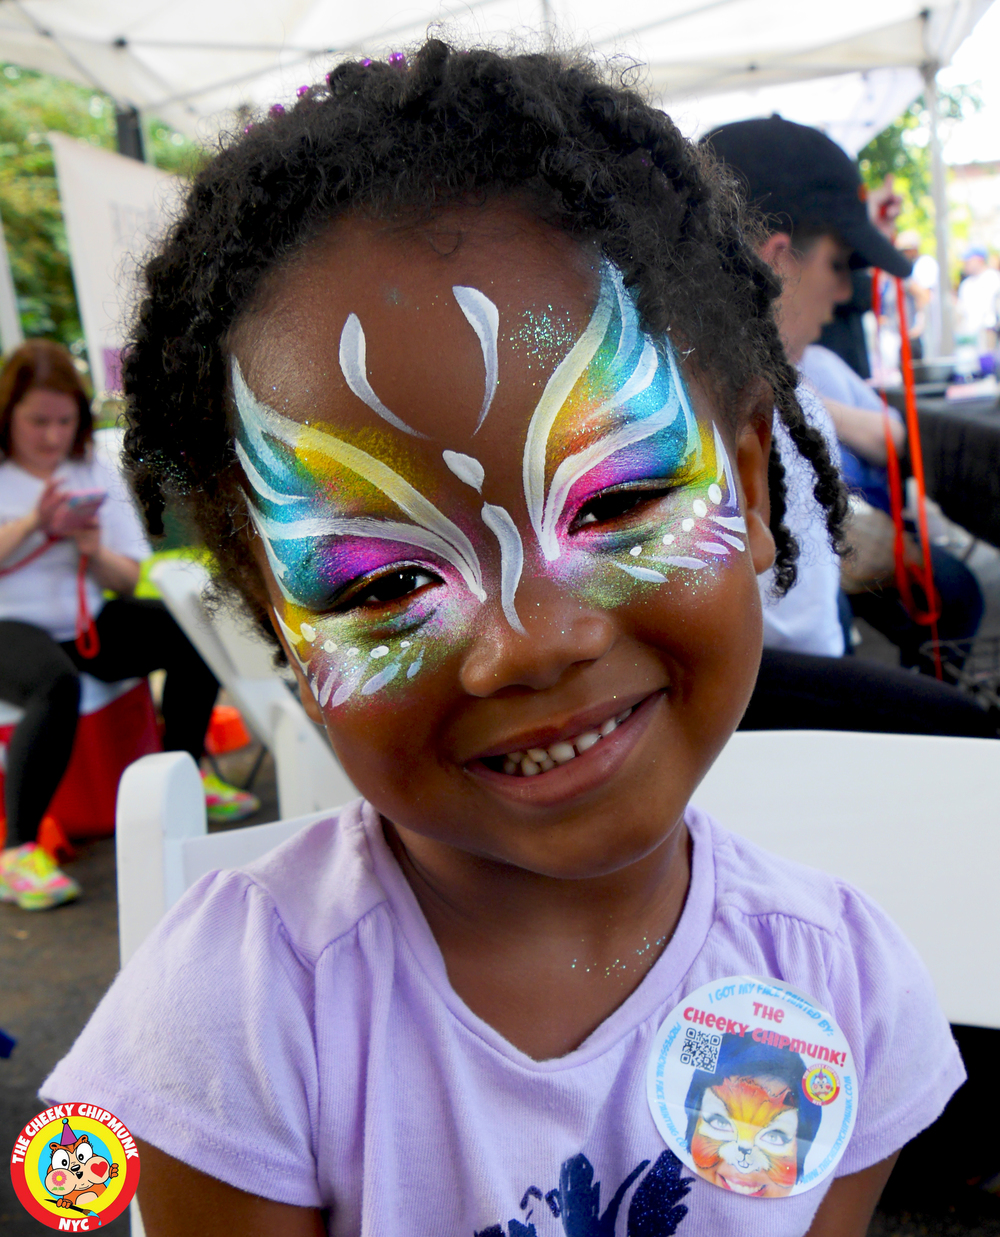 adoptapalooza prospect park rainbow butterfly.jpg